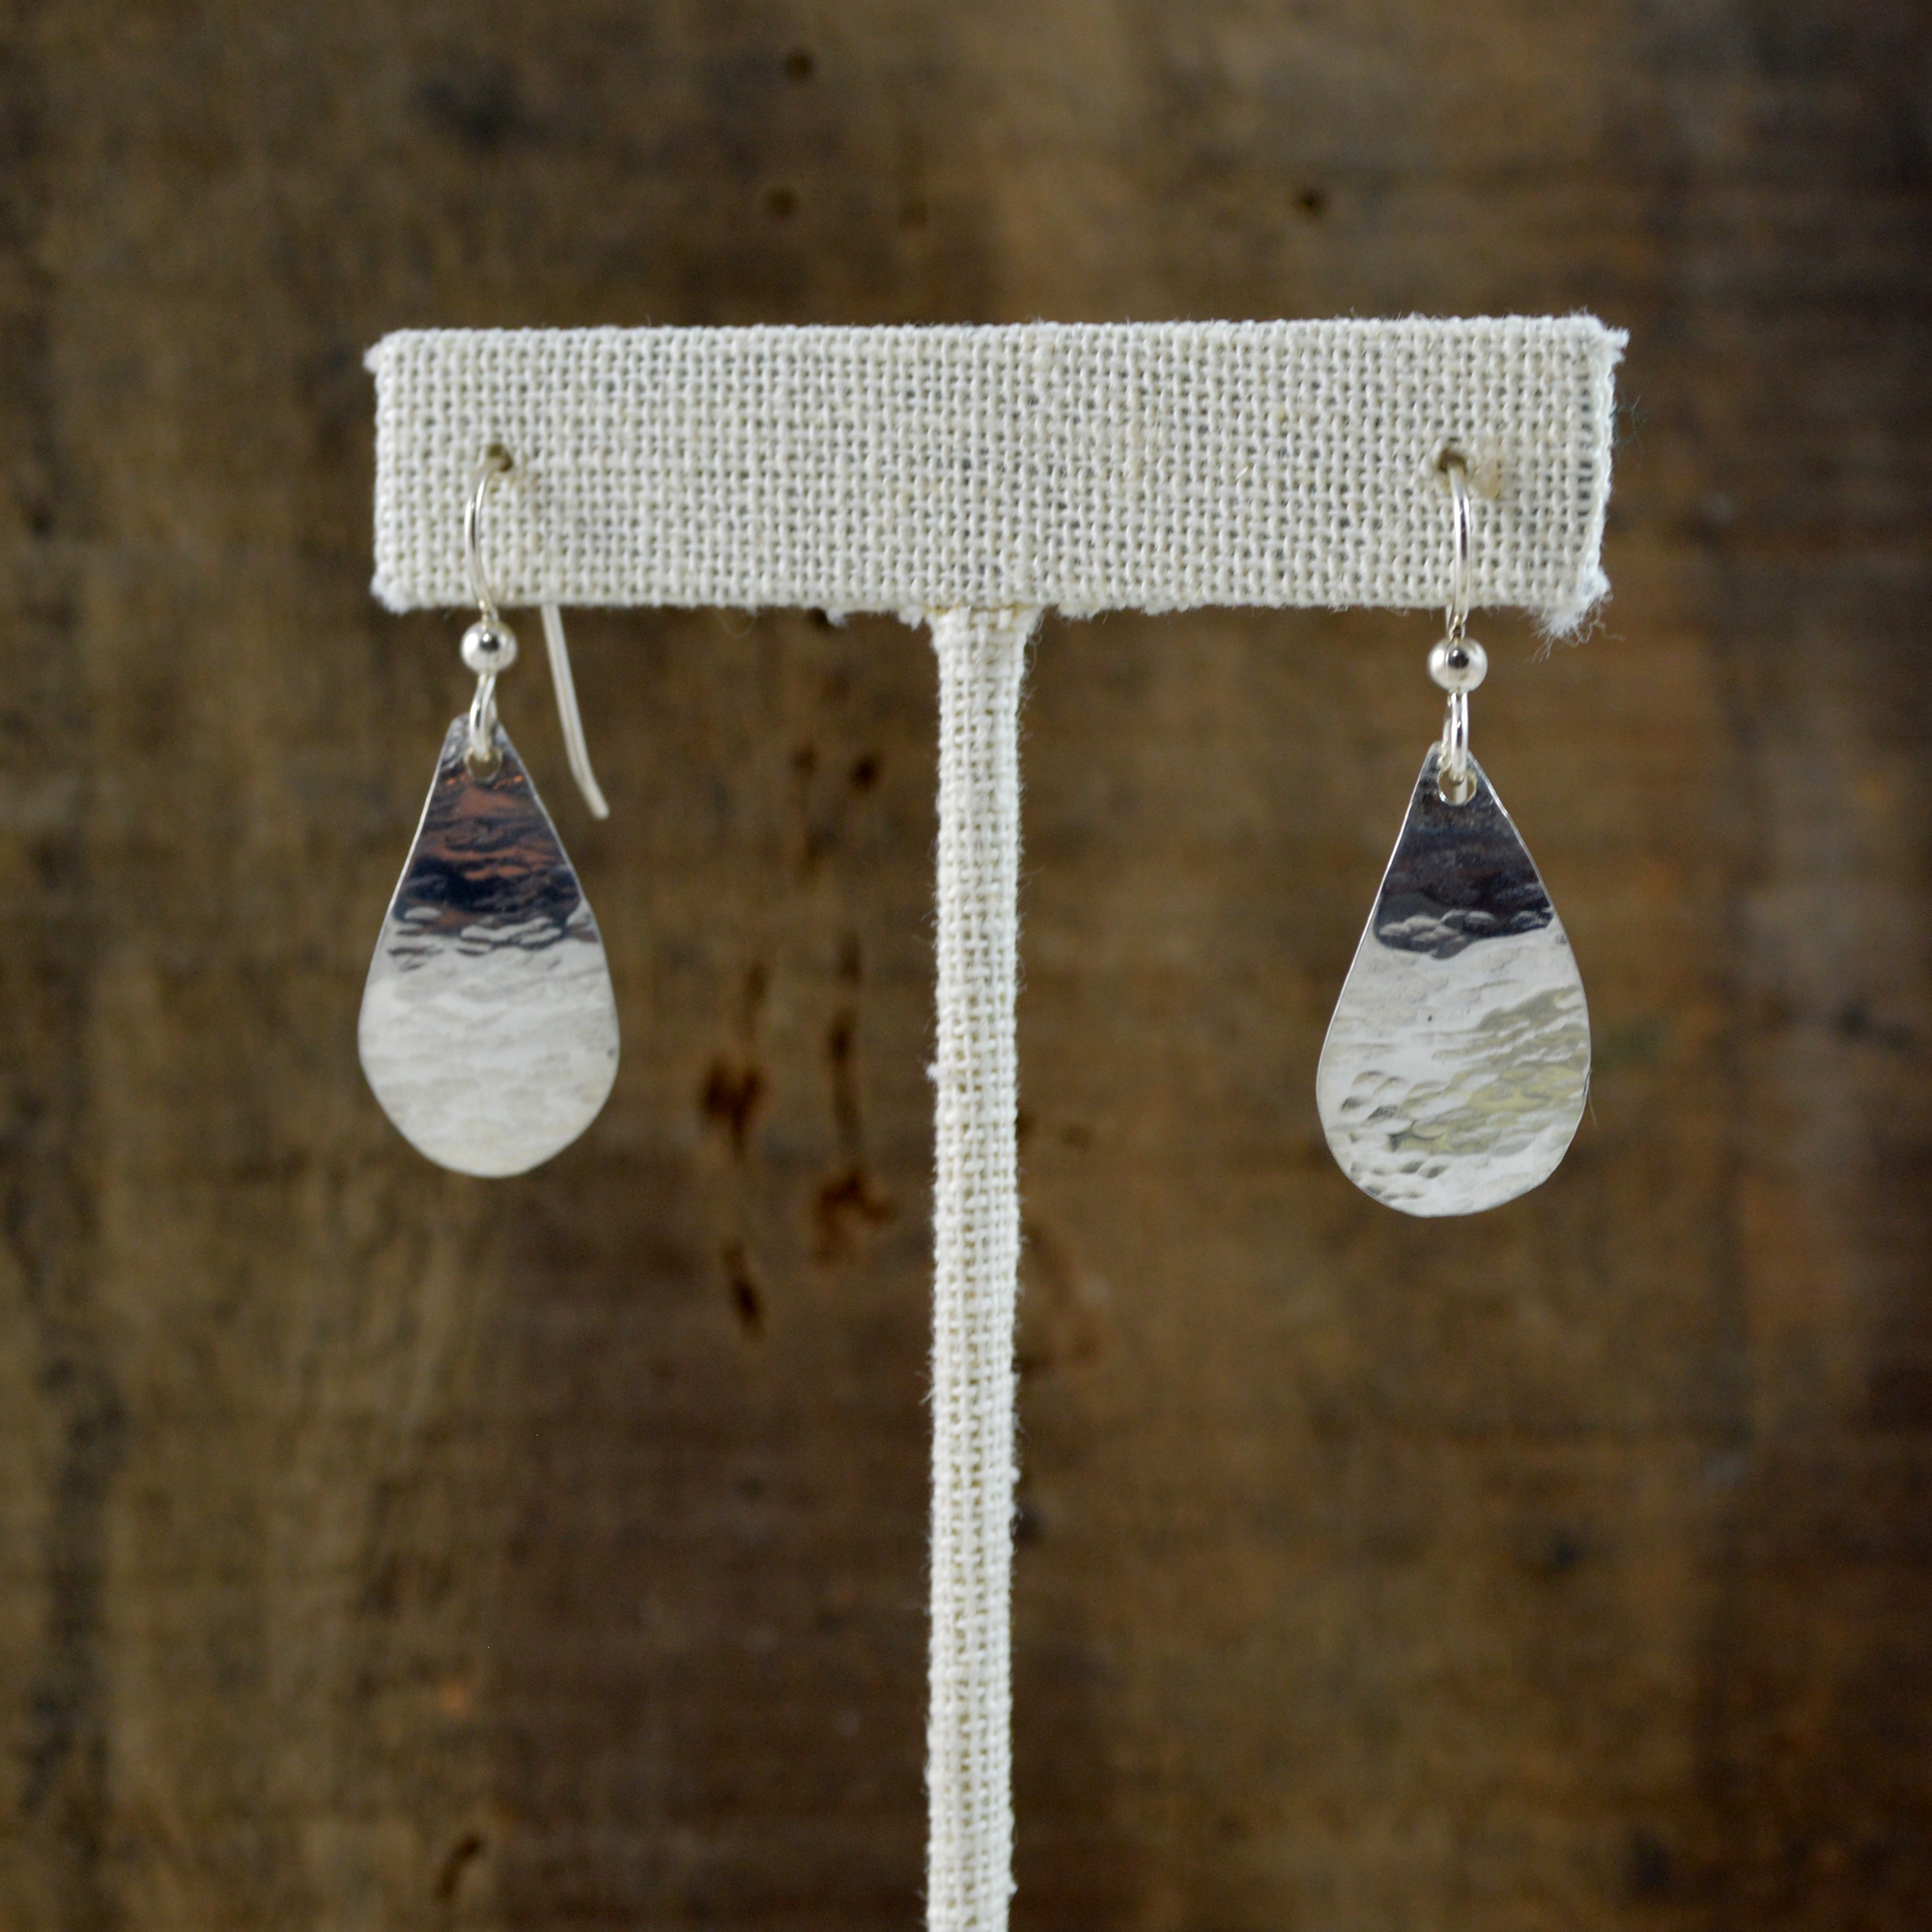 argentium teardrop earrings made in buffalo ny gift shop